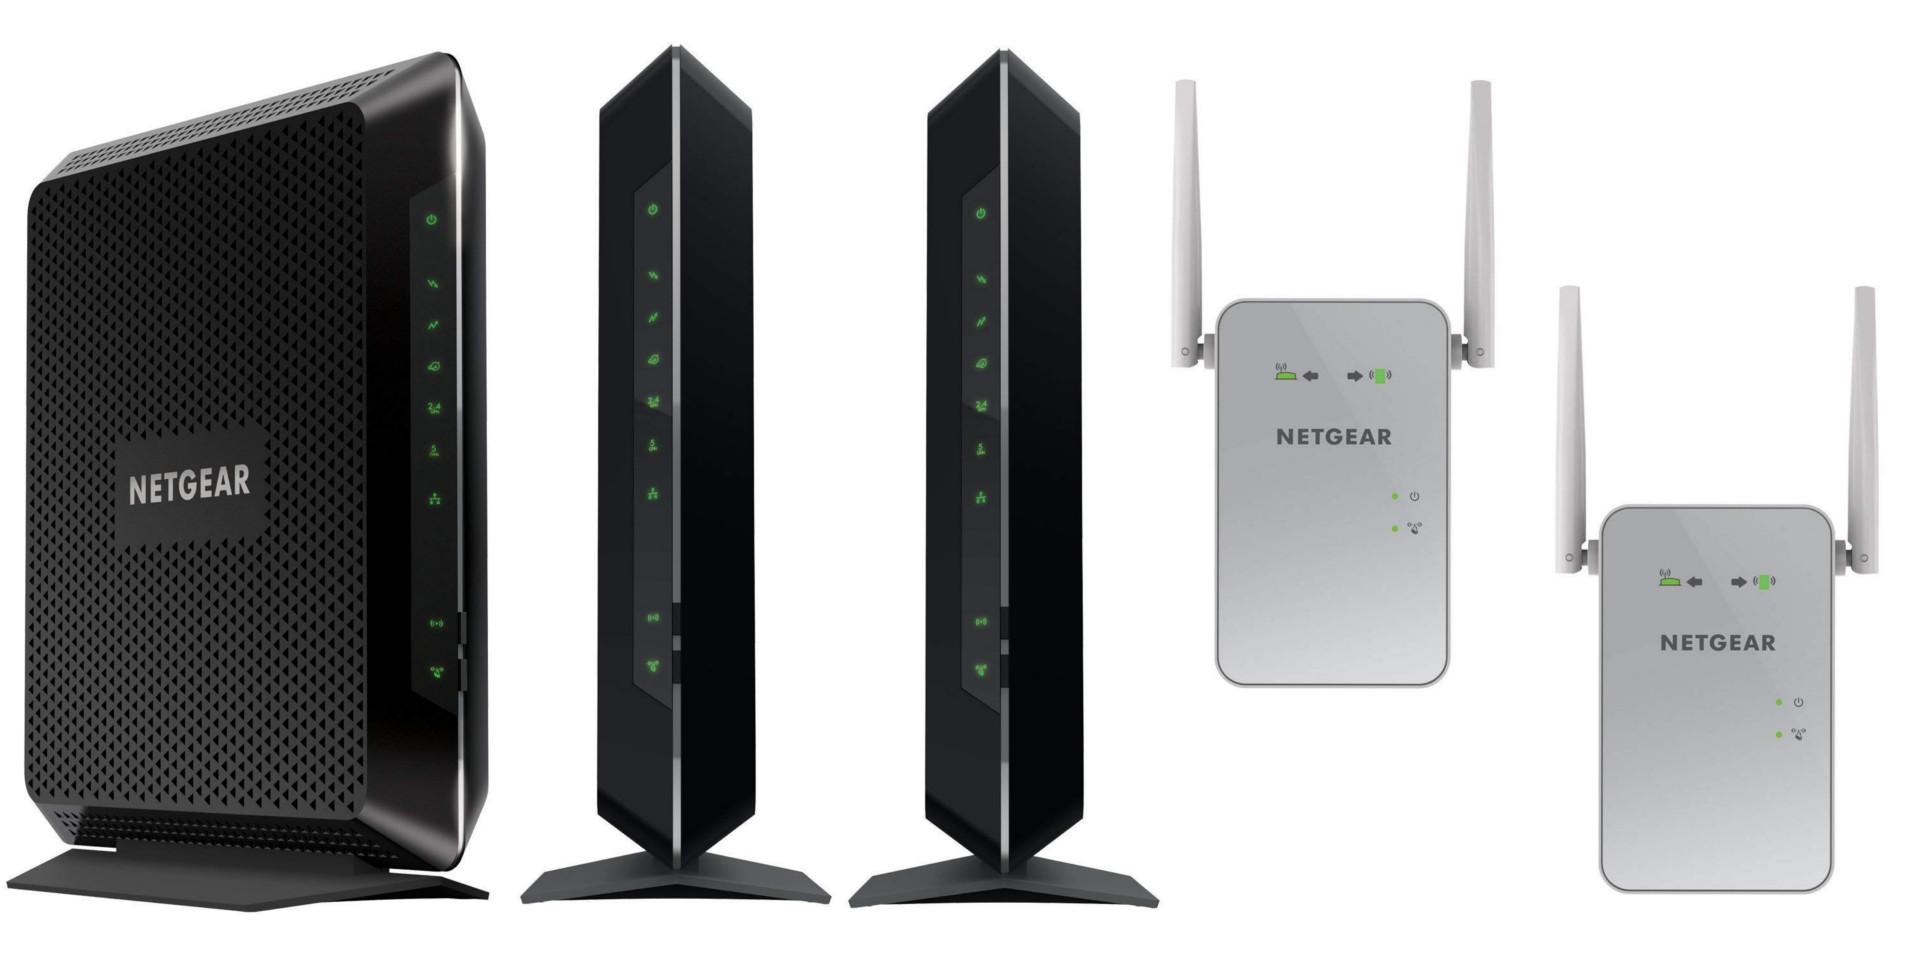 Amazon Refurb Netgear Modem Router Amp Extender Sale From